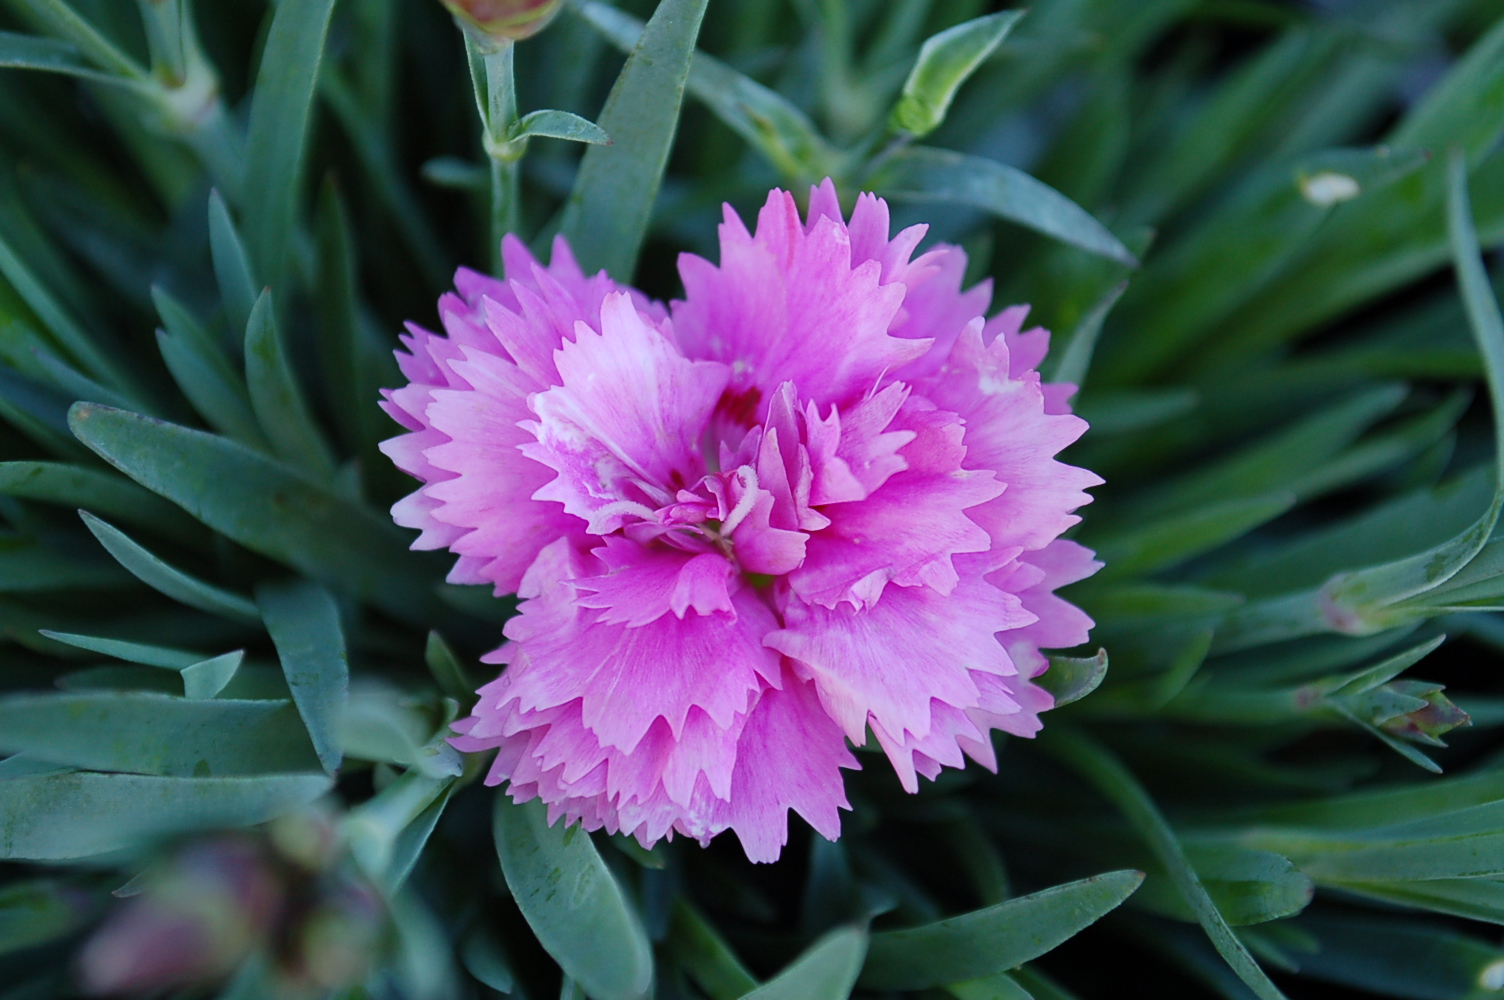 Dianthus interspecific Everlast series 0